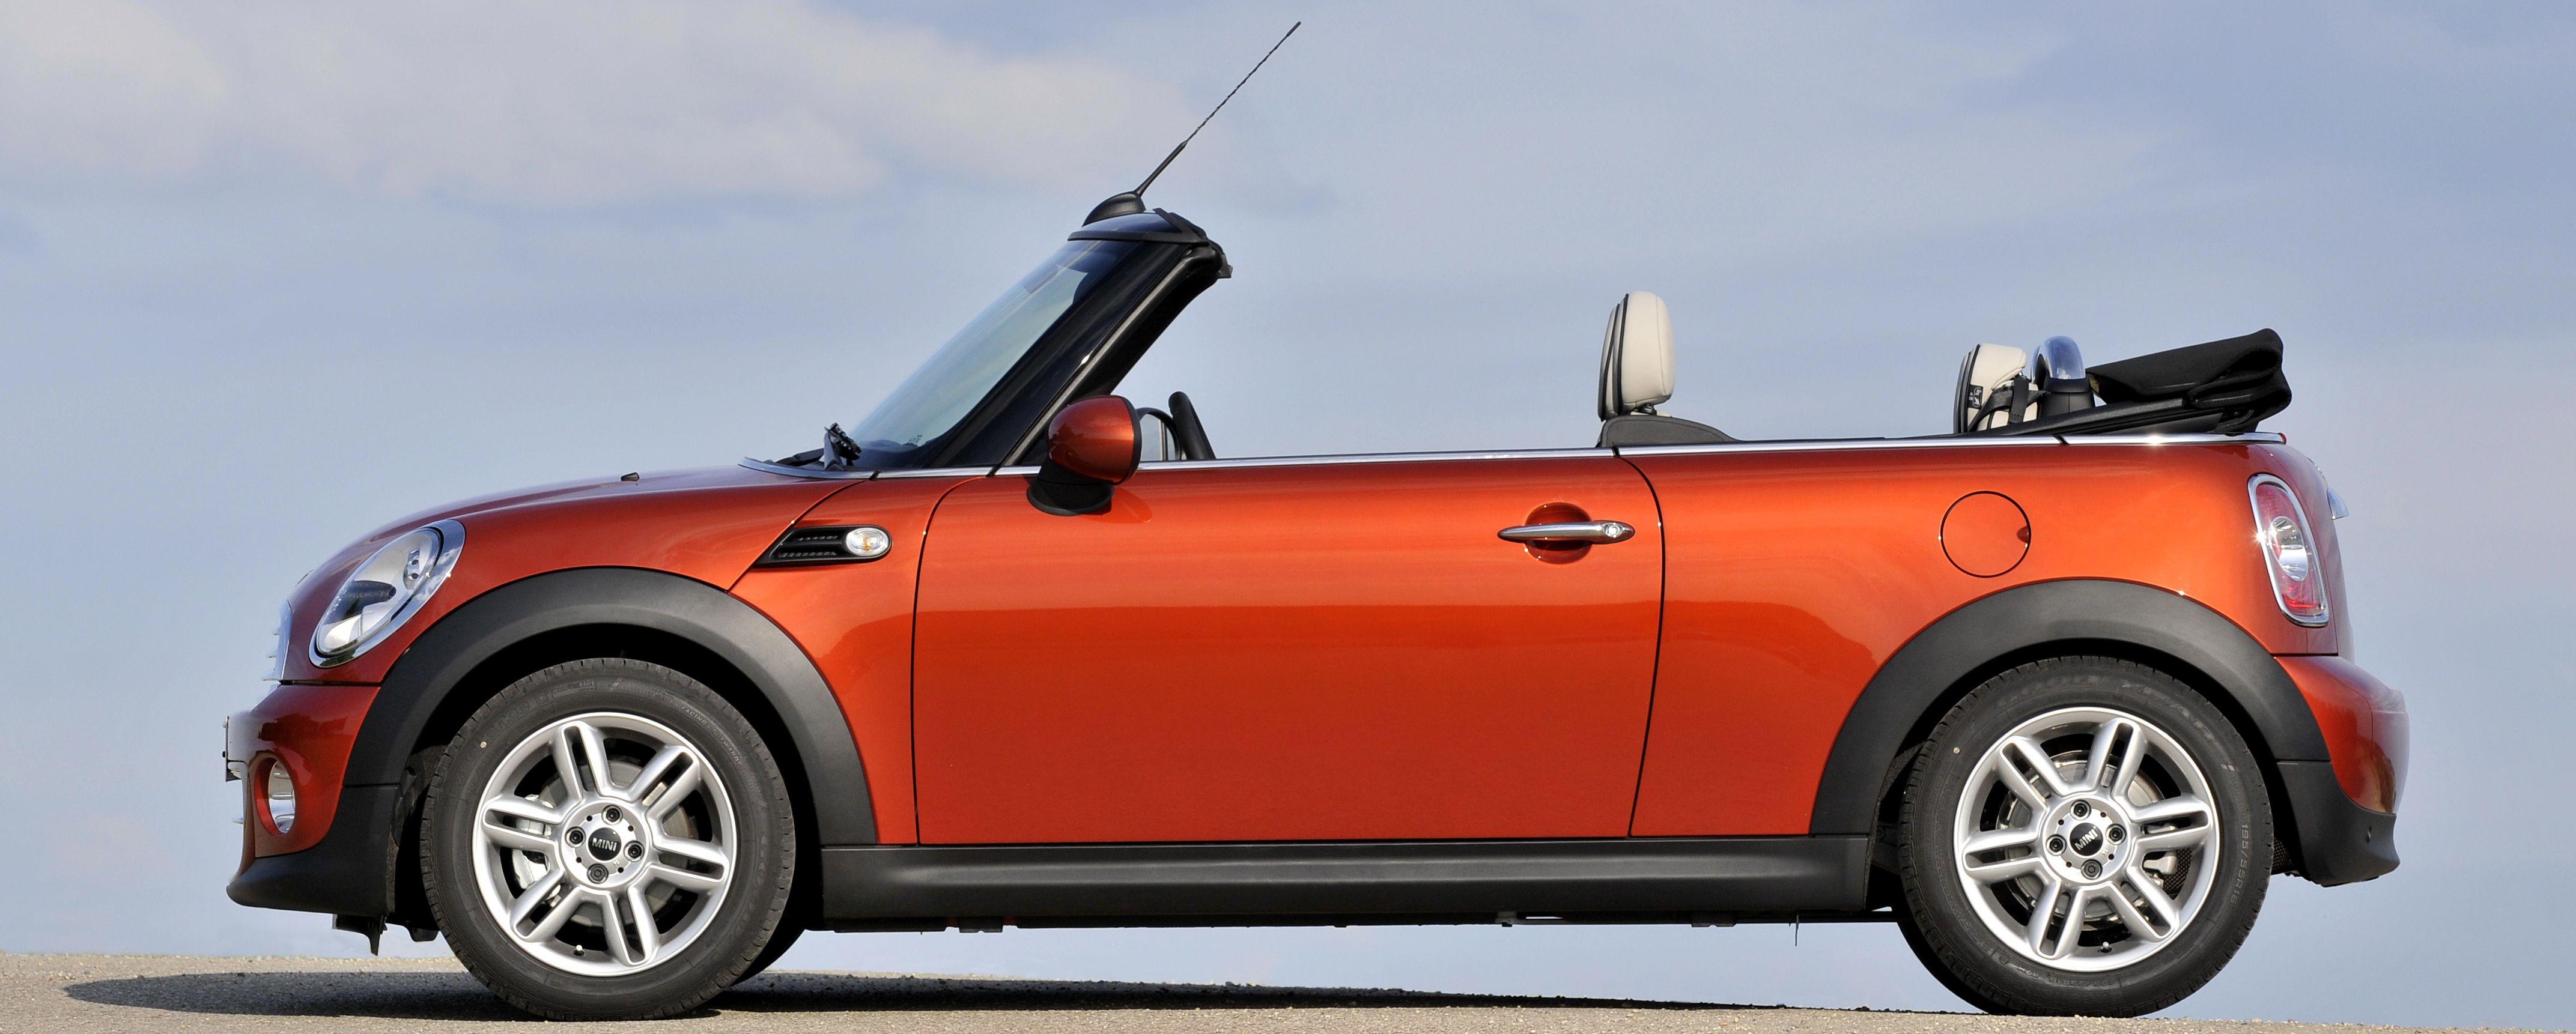 My Spice Orange Mini Cooper Convertible Orange Car New Cars Mini Cooper Convertible